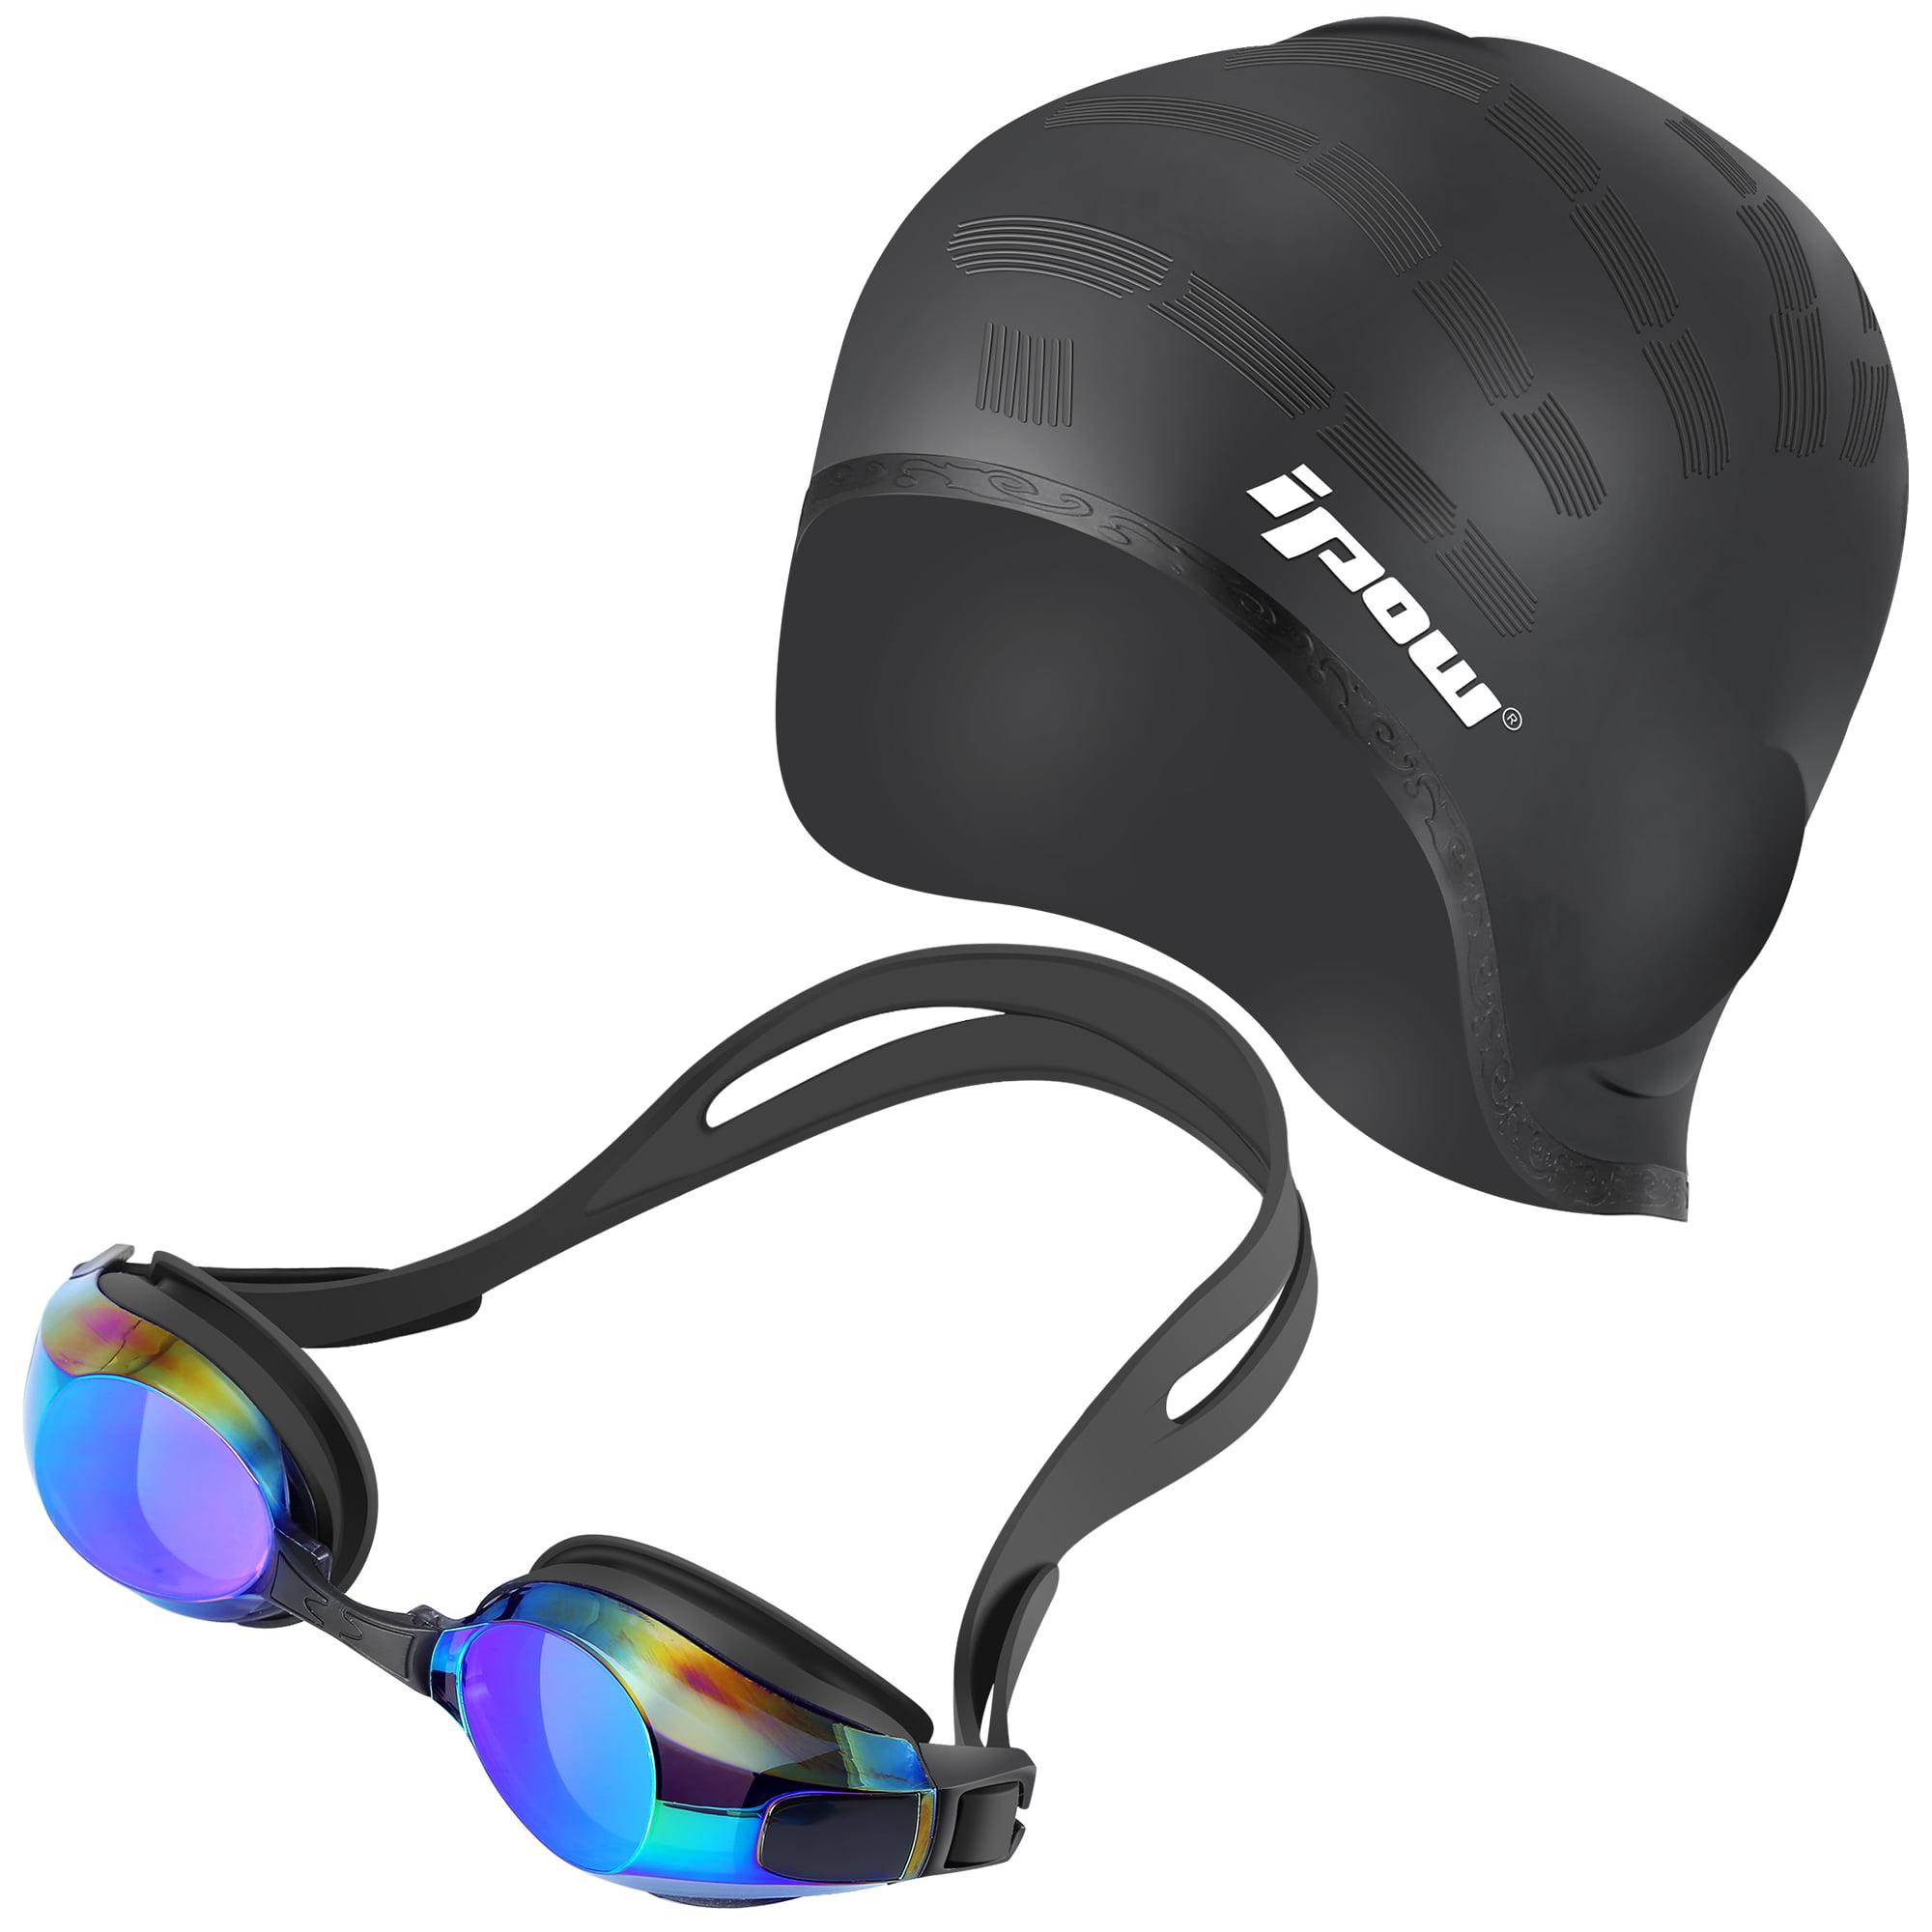 IPOW Swim Goggles + Ear Protection Swim Cap,Anti Fog No Leaking Seal UV Protection Goggle Mask Silicone Elasitc Swimming... by